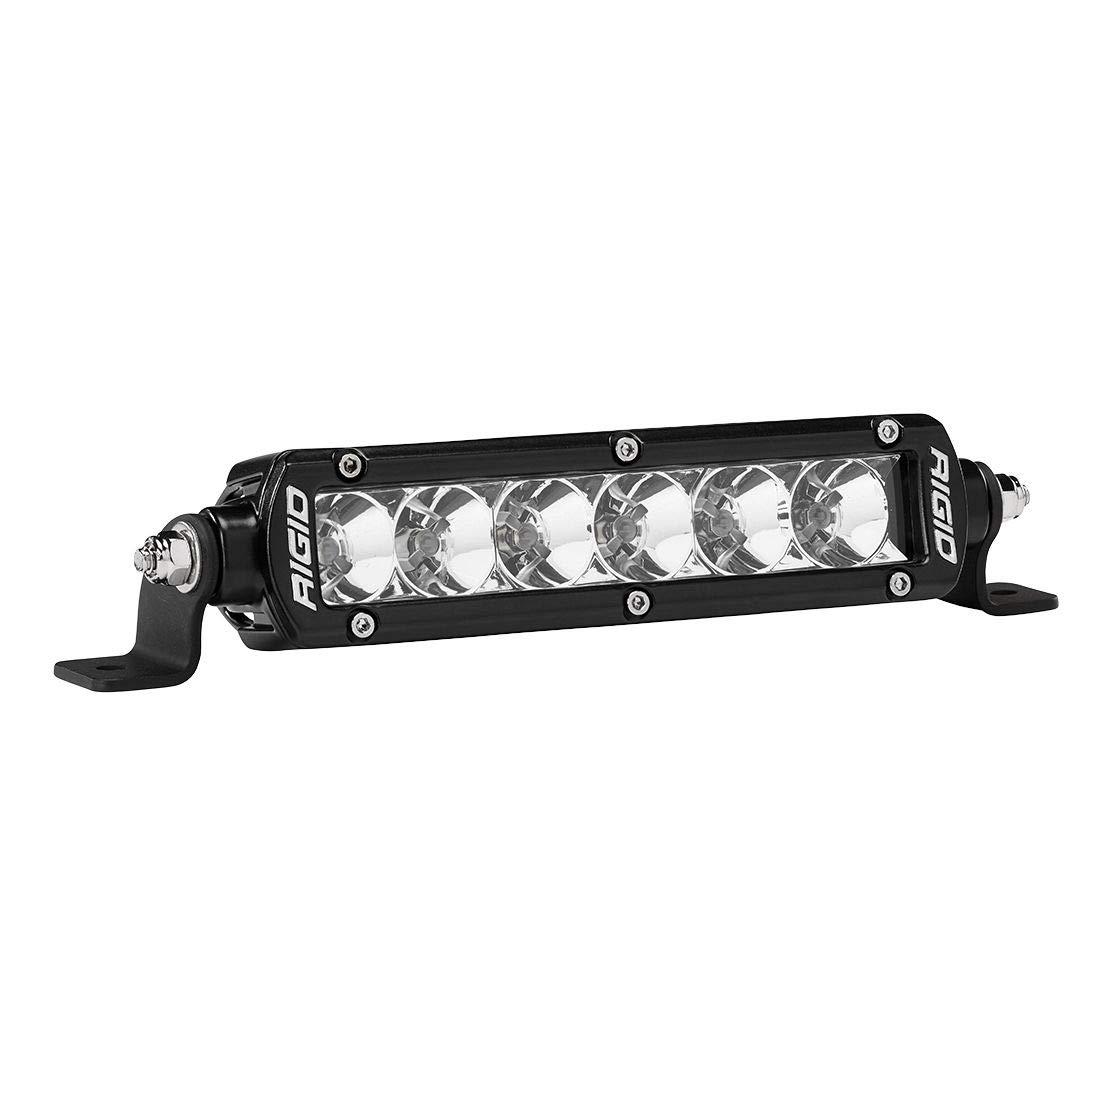 Rigid Light Bar >> Amazon Com Rigid 906113 Black Sr Series Pro 6 Flood Led